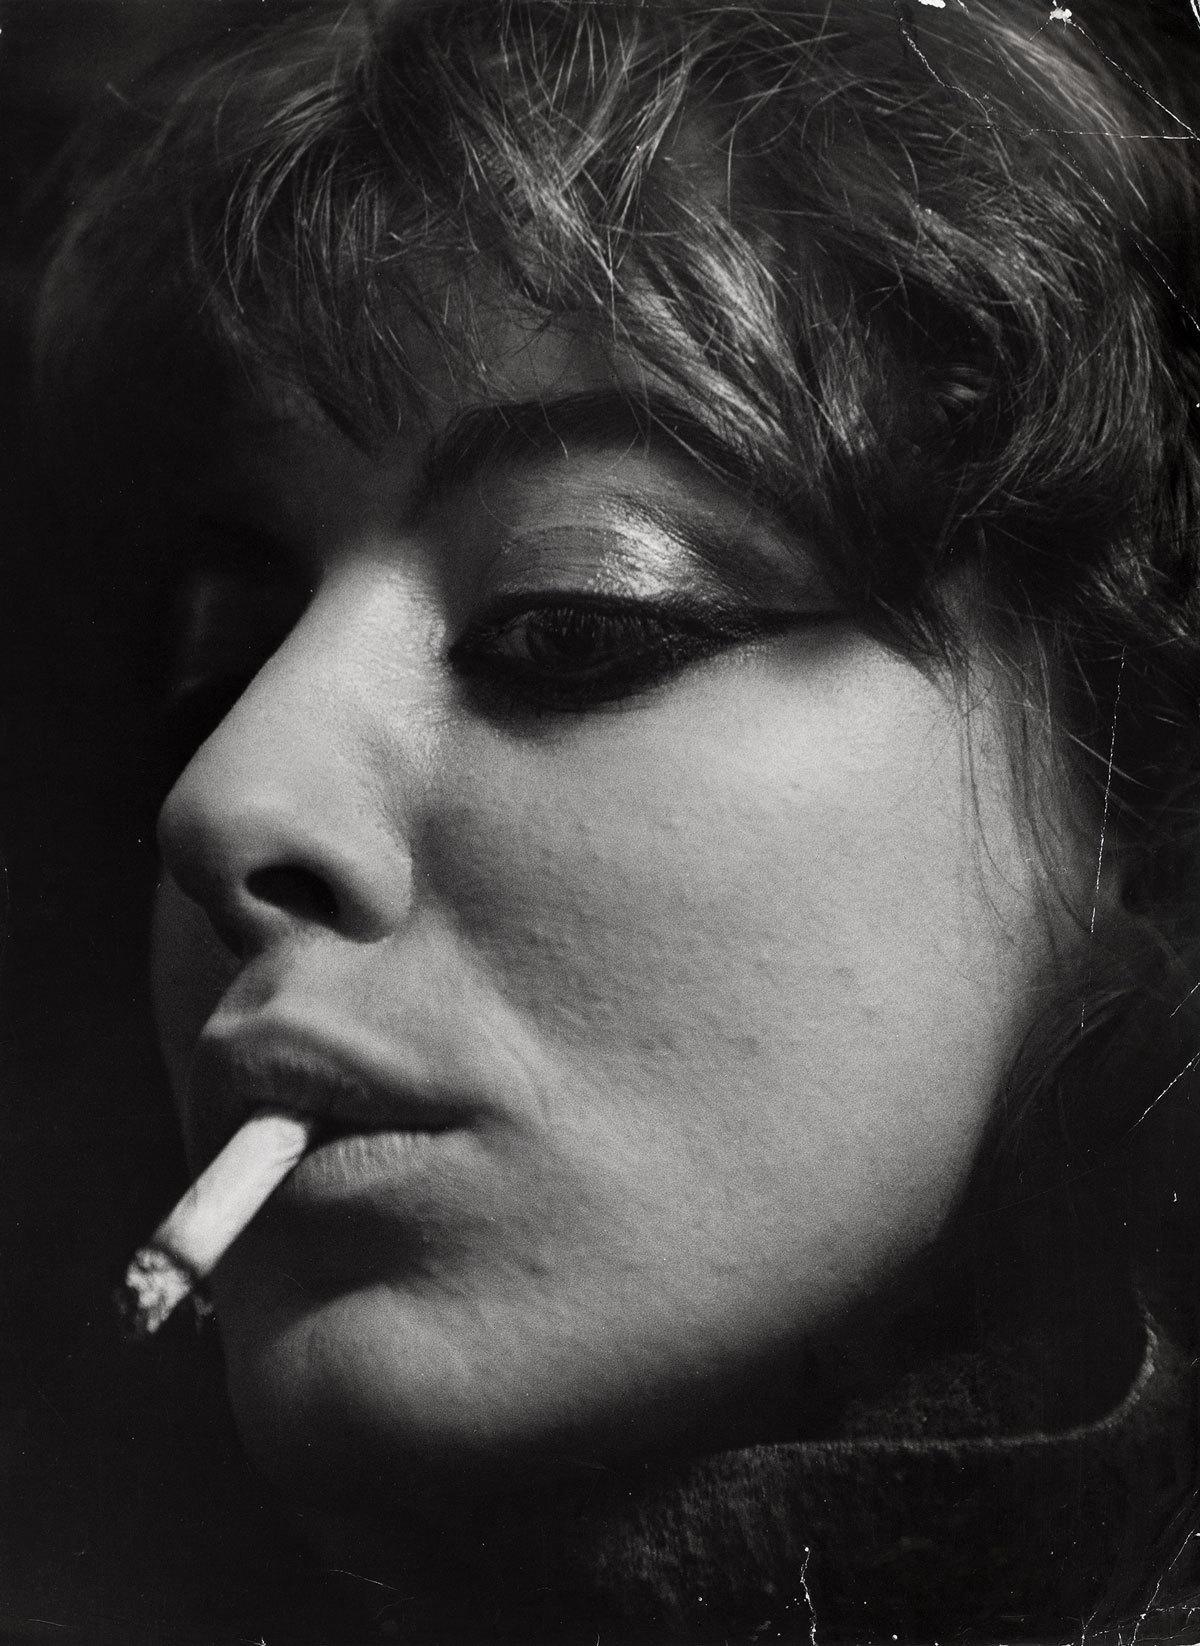 """La Vie Folle"" Ed van der Elsken Retrospective in Paris (9 pics)"